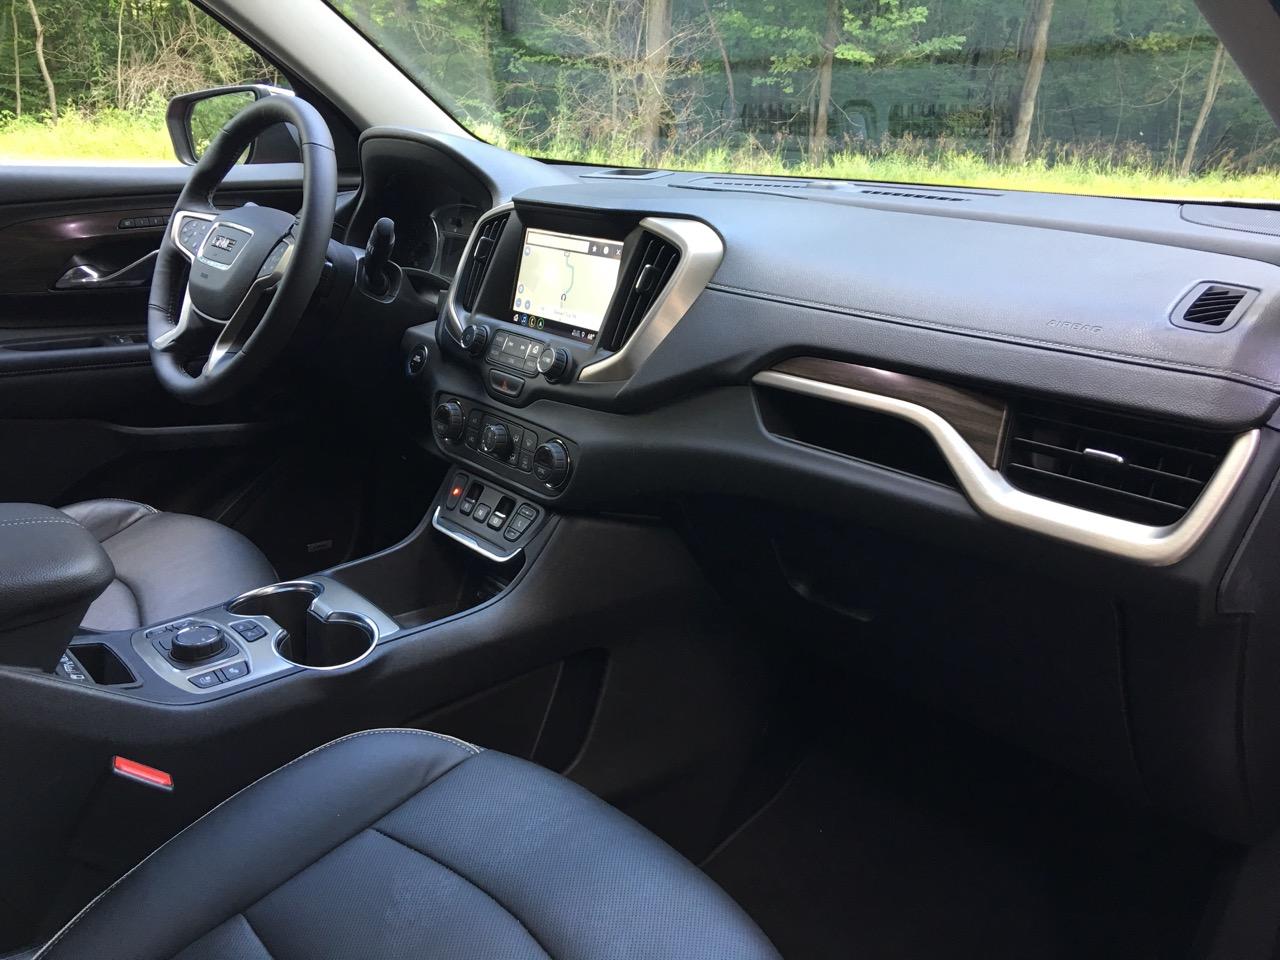 First Drive Redesigned 2018 Gmc Terrain Carfax Blog